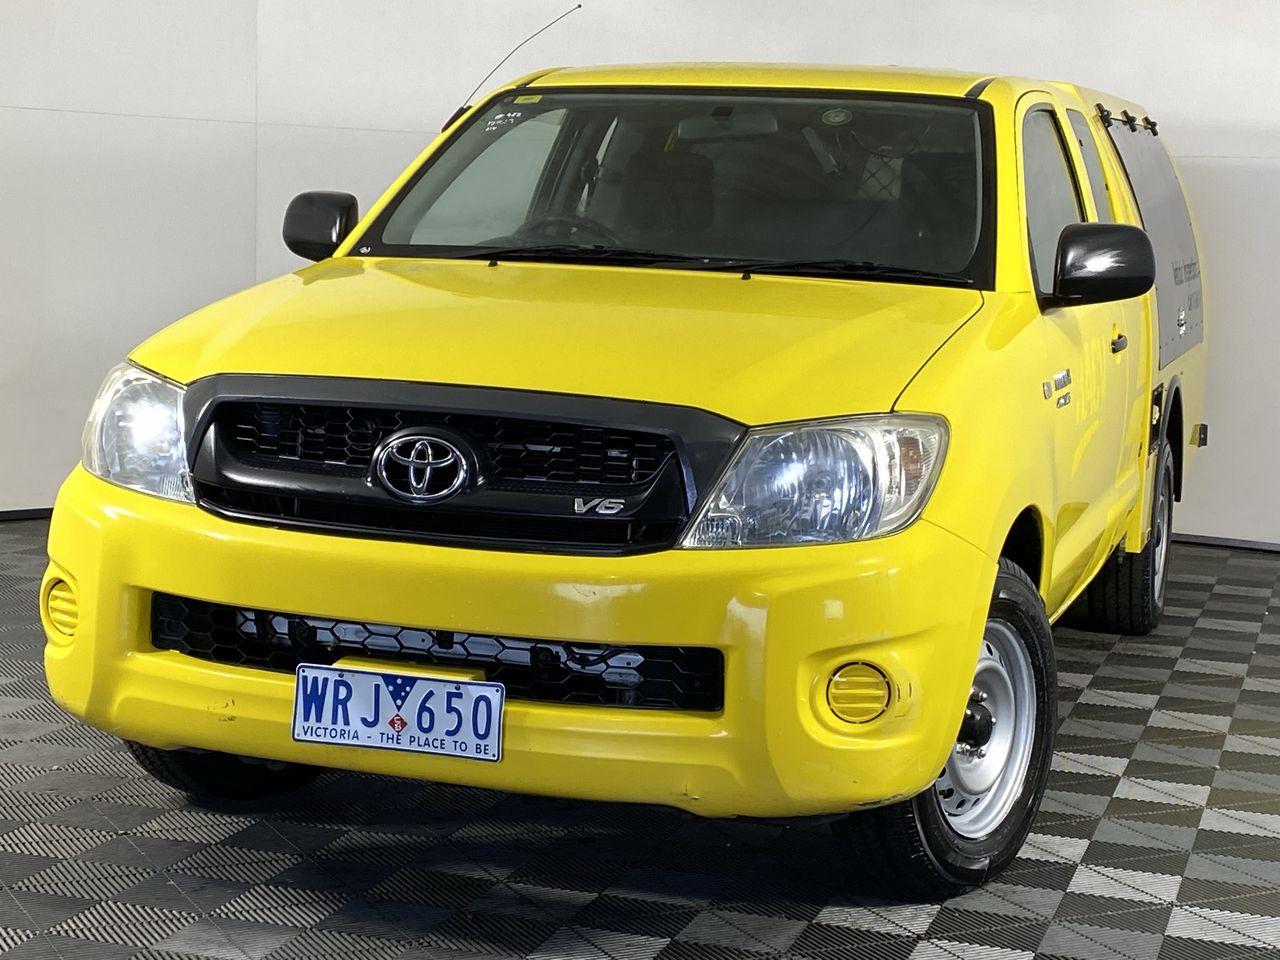 2008 Toyota Hilux XTRA CAB 4X2 SR GGN15R Auto Ute (EX RACV)